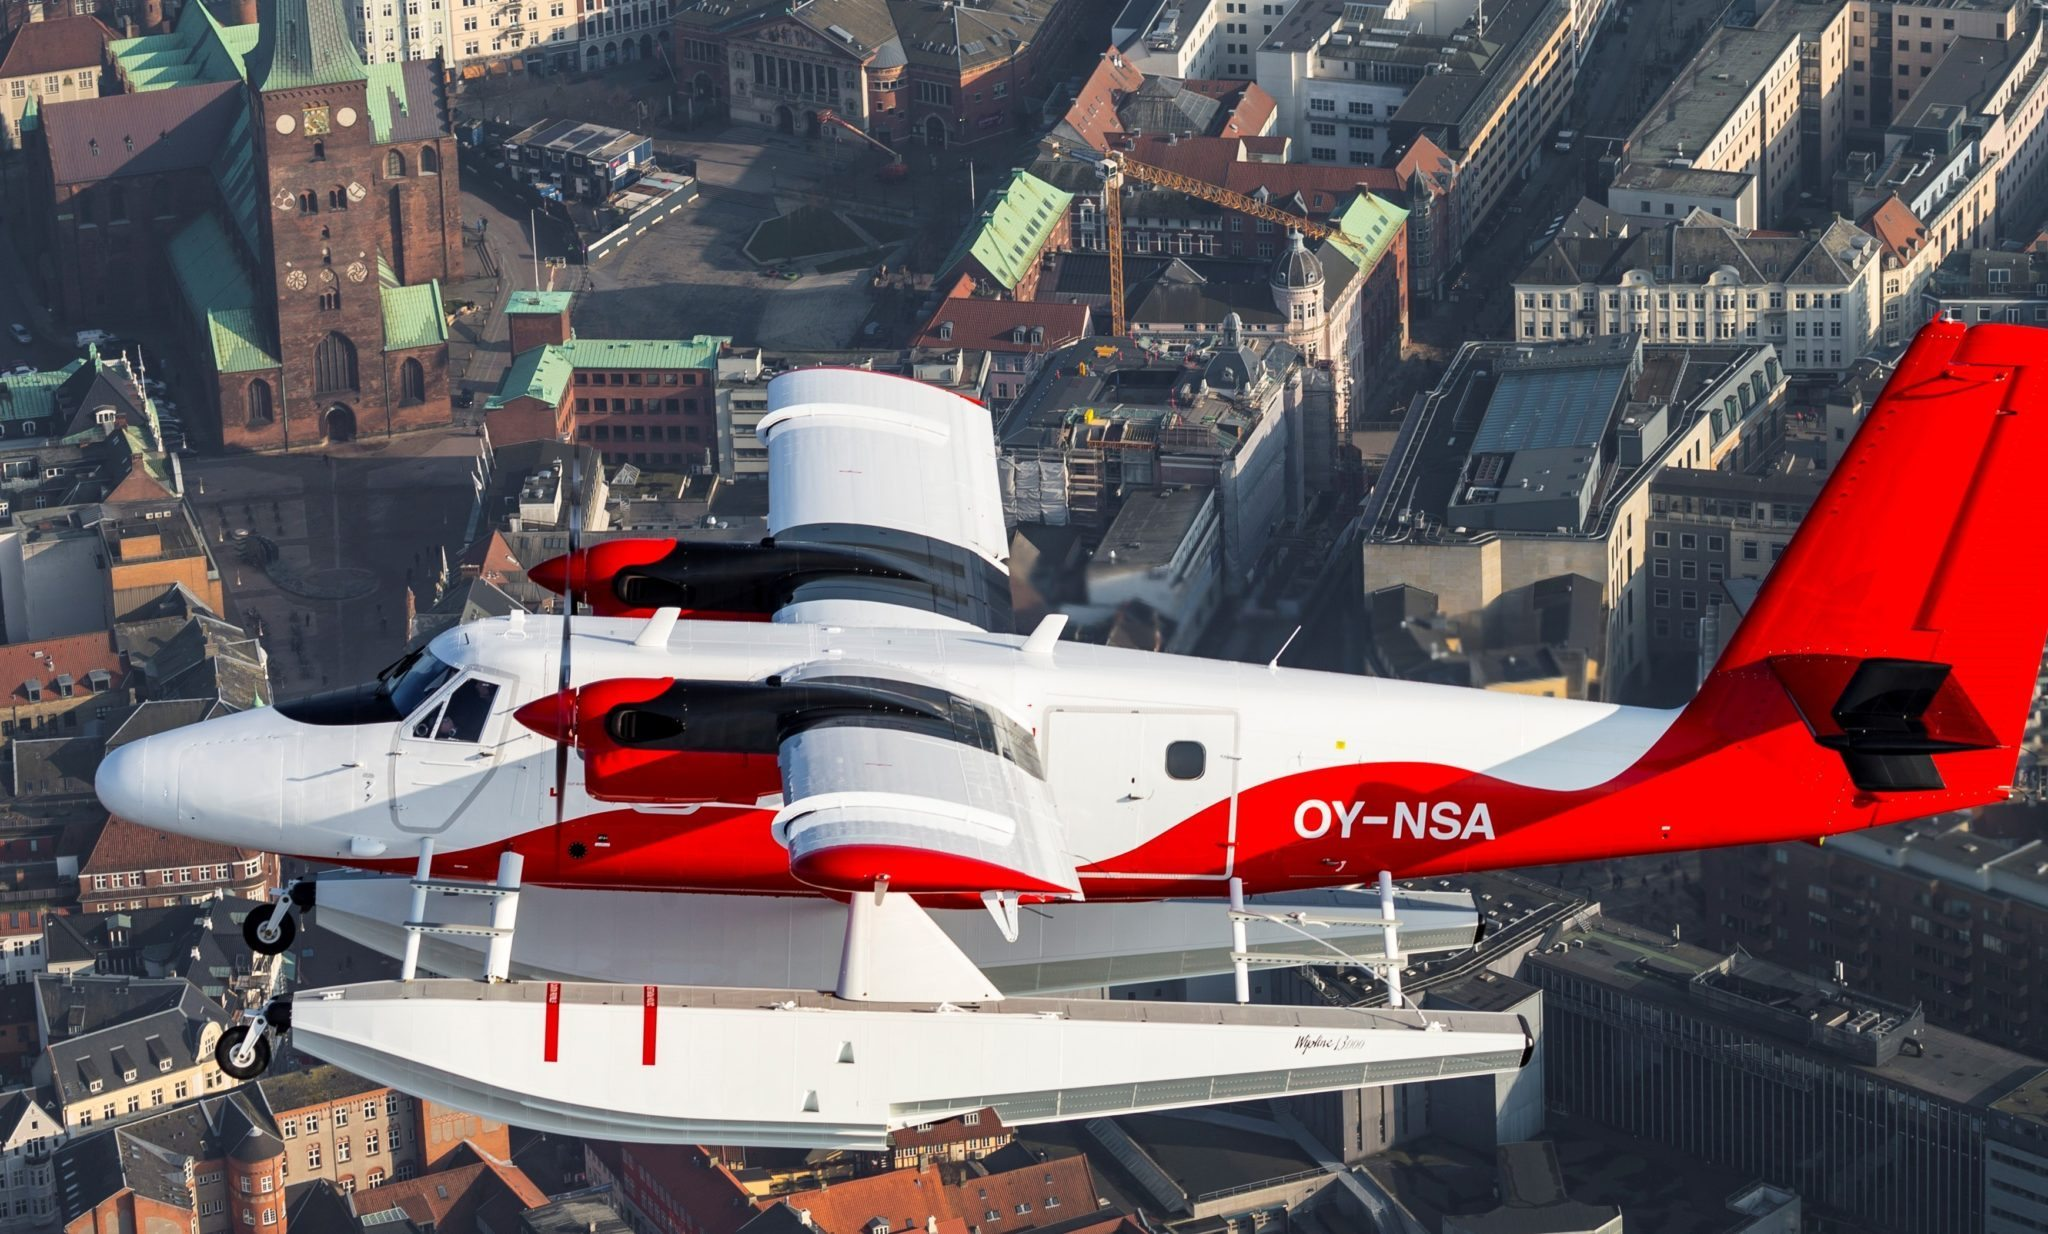 Nordic Seaplanes vandflyver over Aarhus. Foto: Nordic Seaplanes.